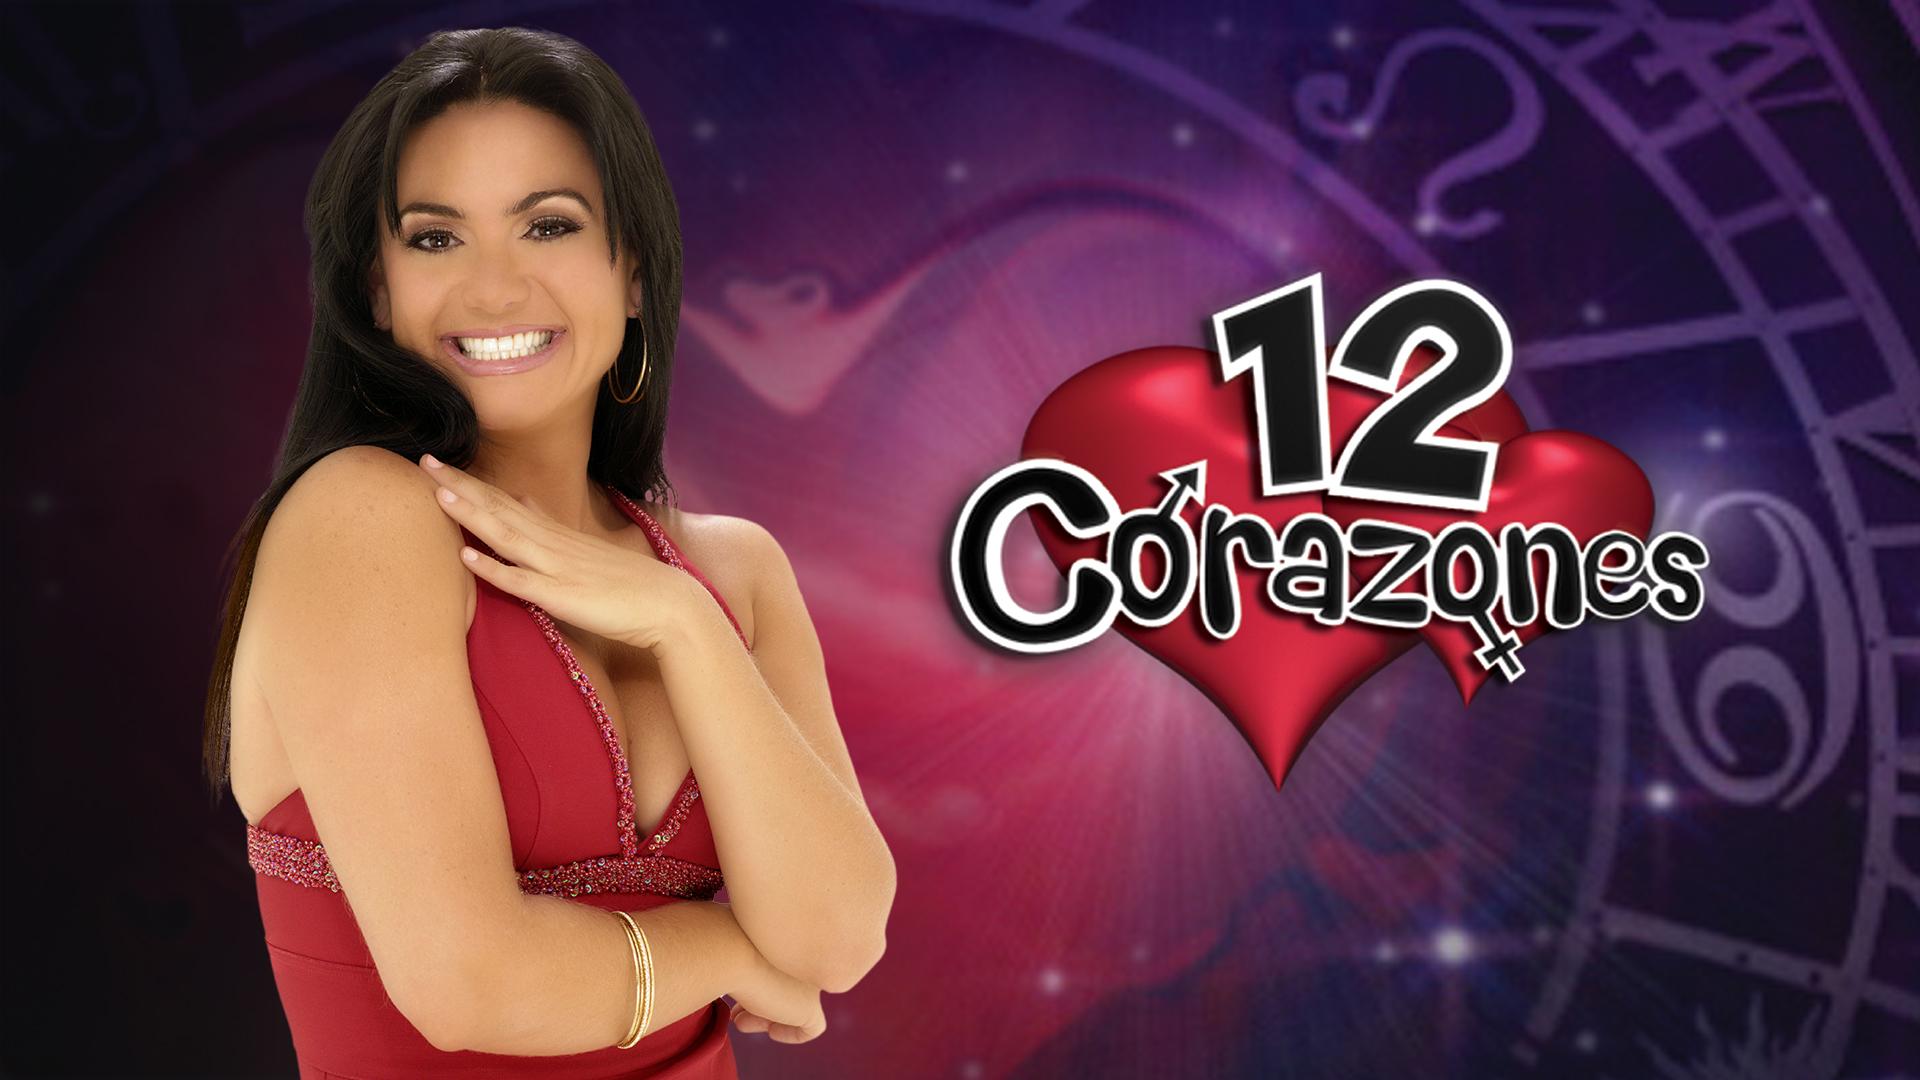 http://www.telemundo.com/sites/nbcutelemundo/files/sites/nbcutelemundo/files/images/tv_show/10_12Corazones_1920x1080_2.jpg